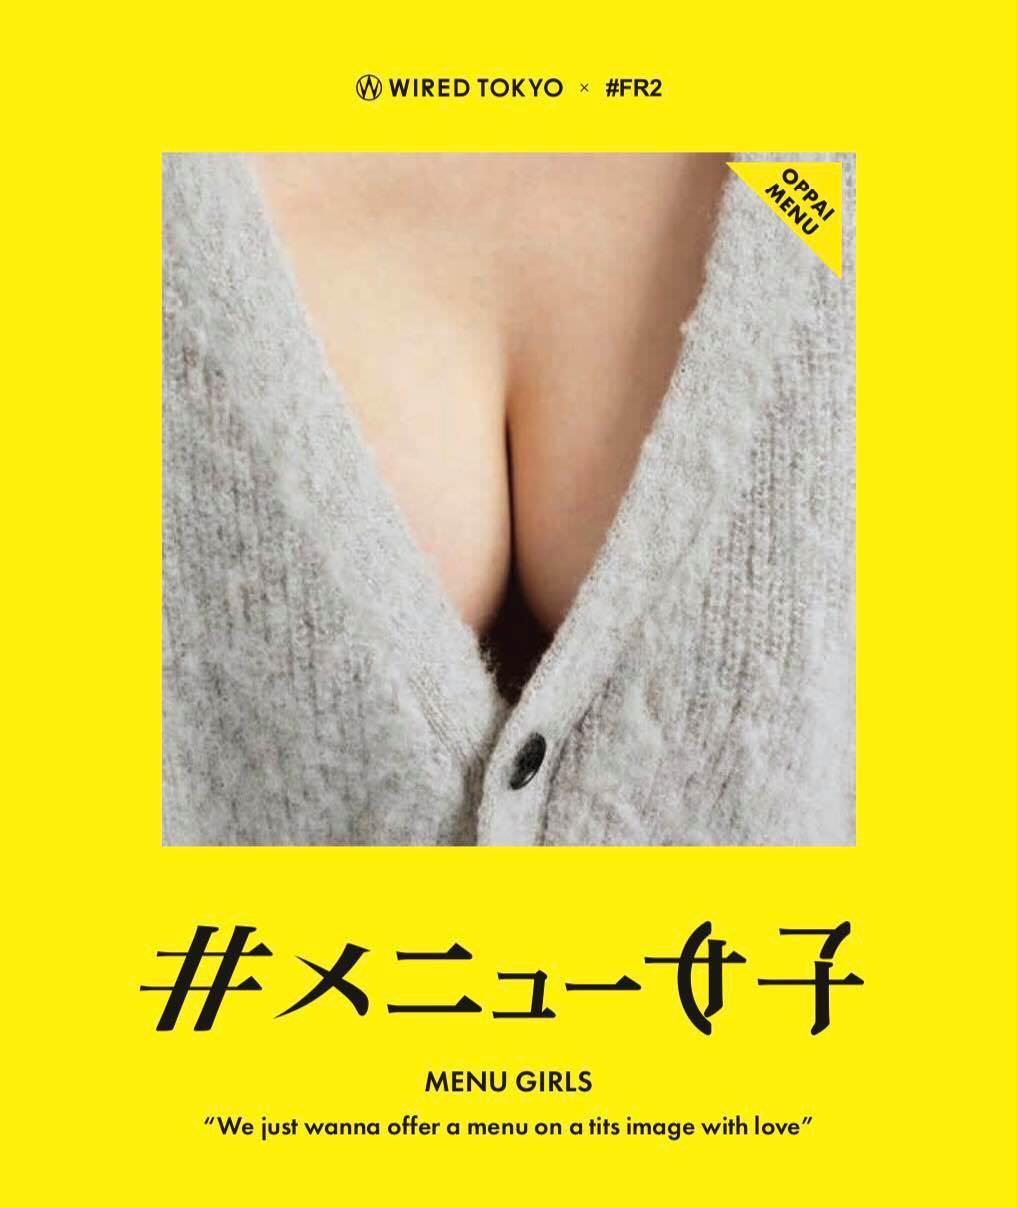 #FR2がWIRED CAFEをジャック! 新プロジェクト『メニュー女子』を始動! 一点物の100万円リングも発売